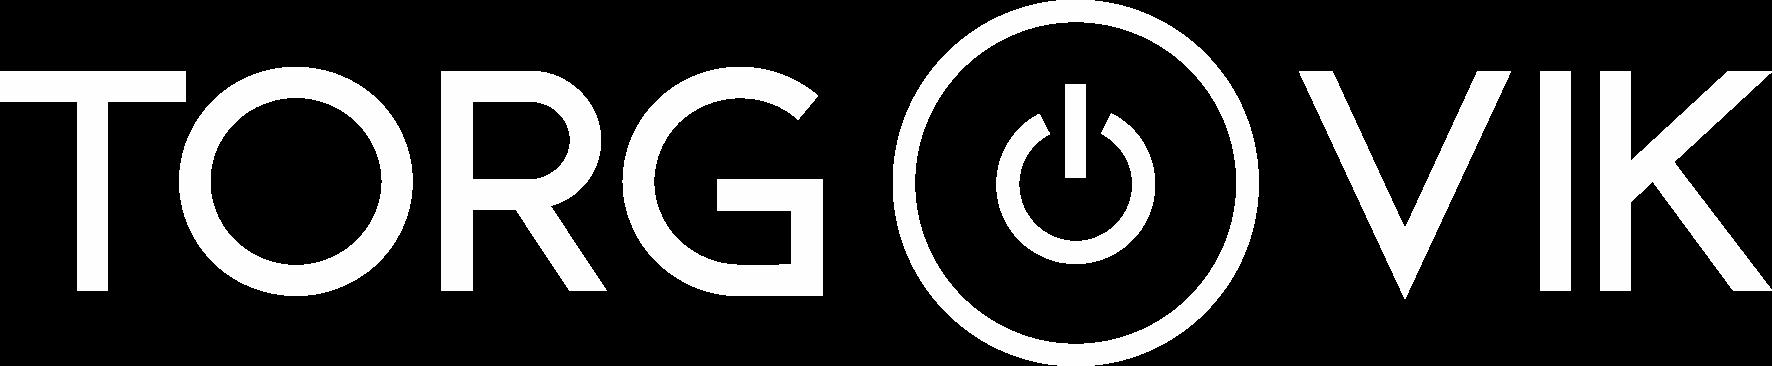 TORGOVIK.NET